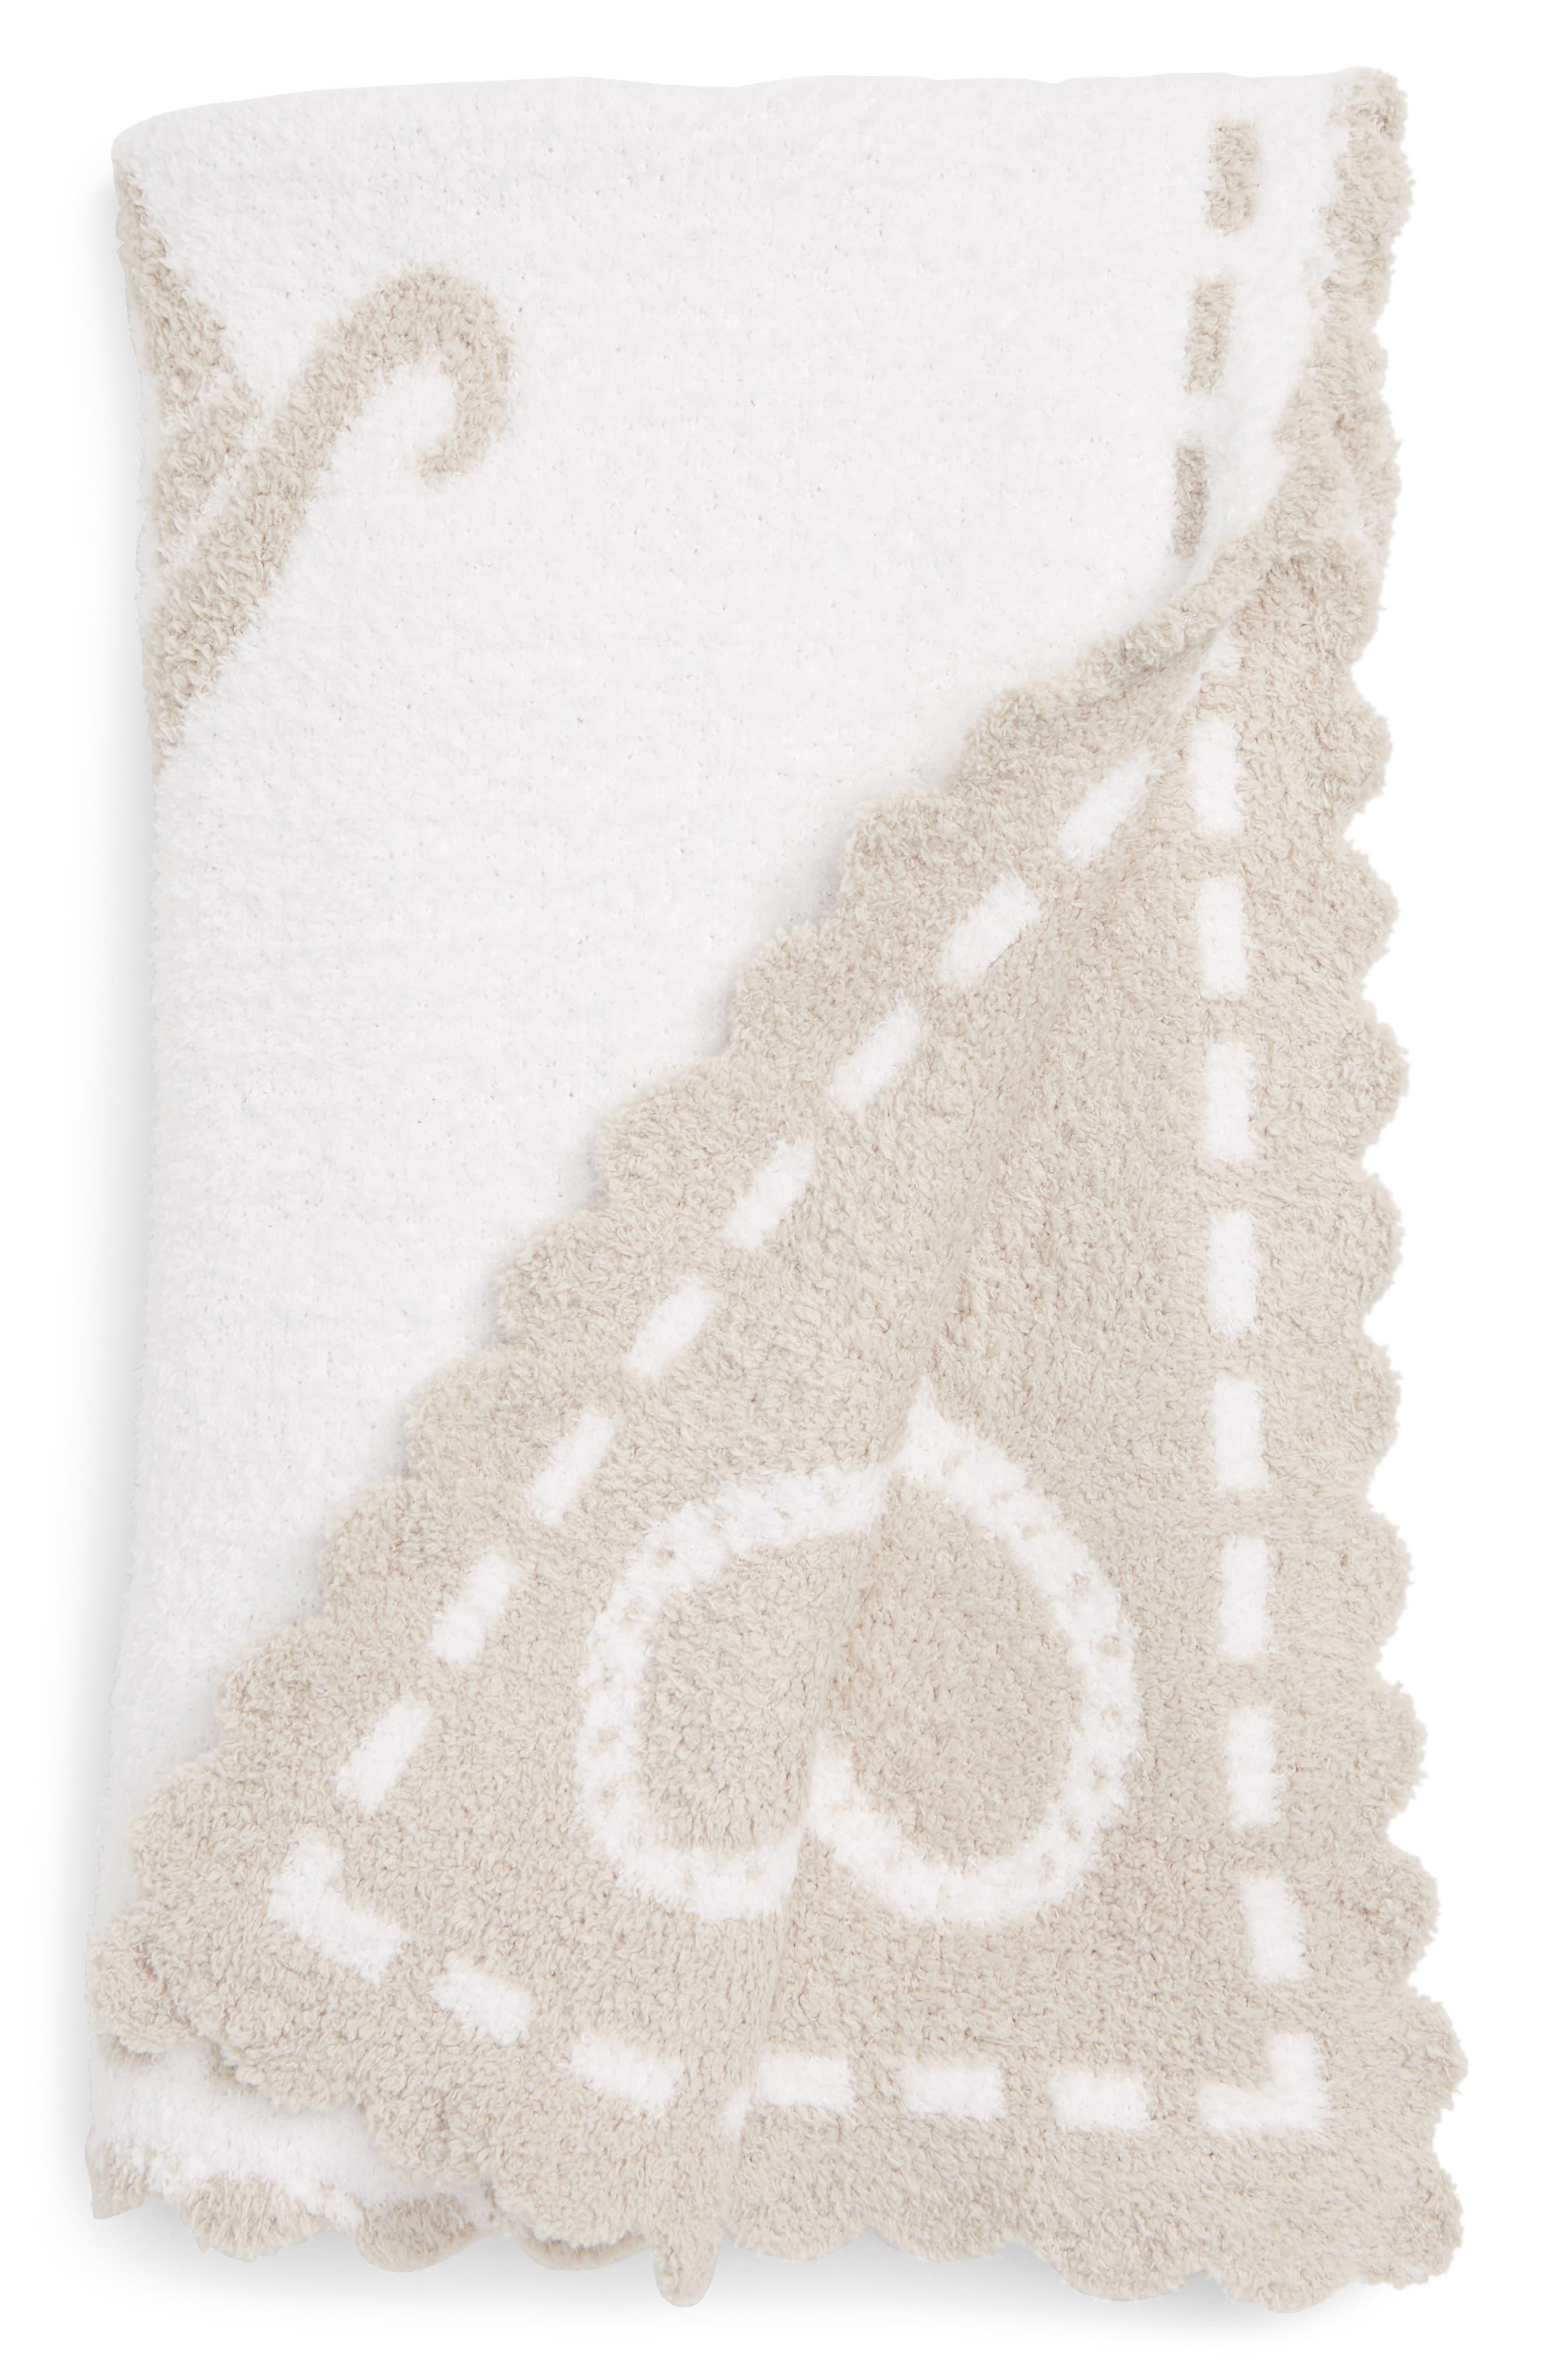 Receiving Blanket,                             Main thumbnail 1, color,                             250